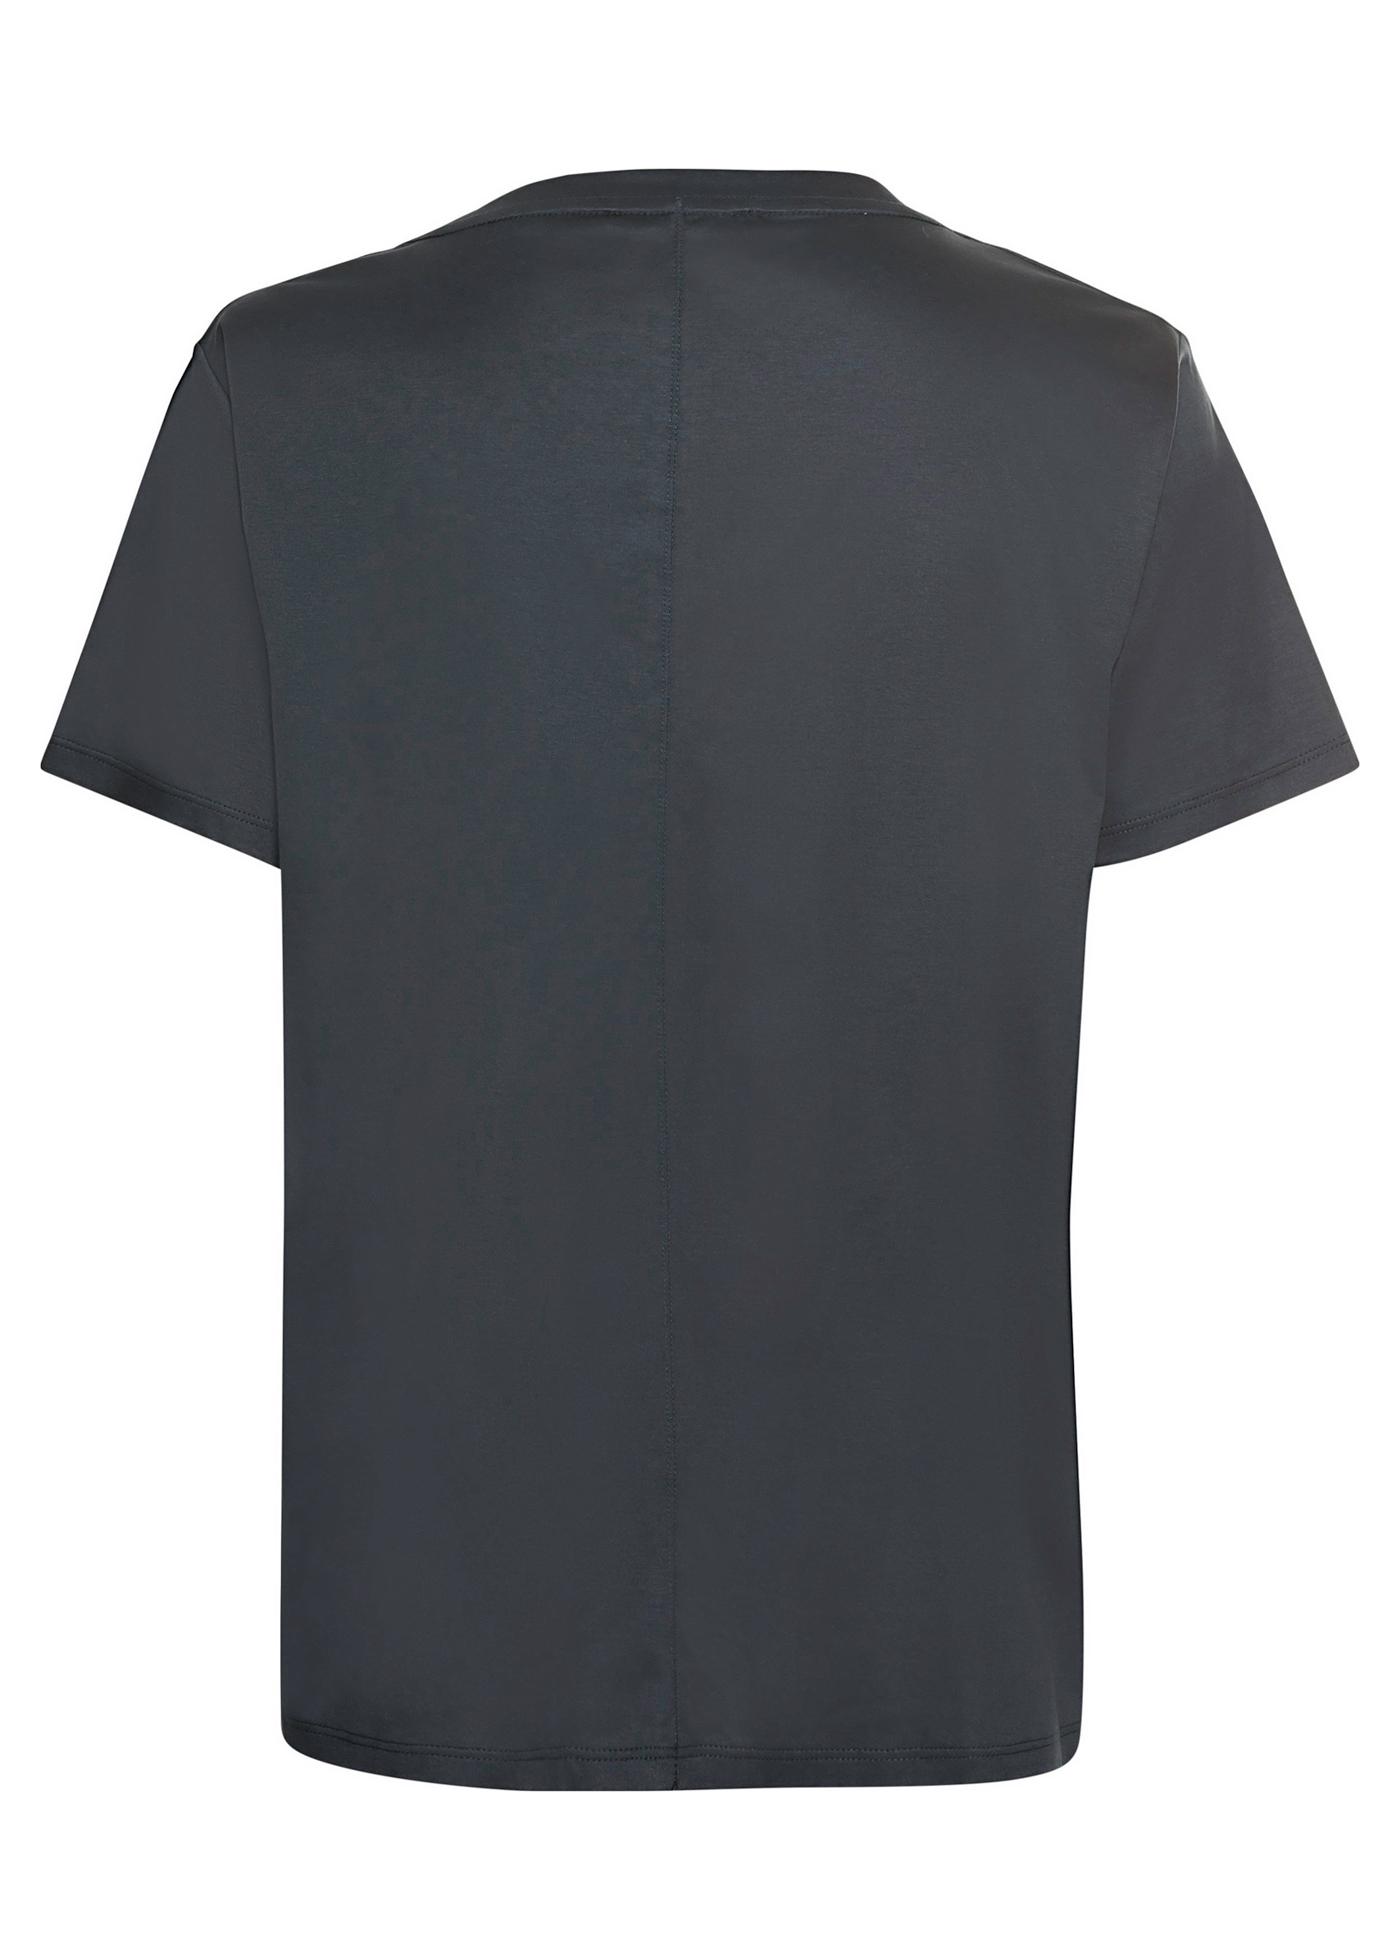 T-Shirt mit Paisley-Print image number 1